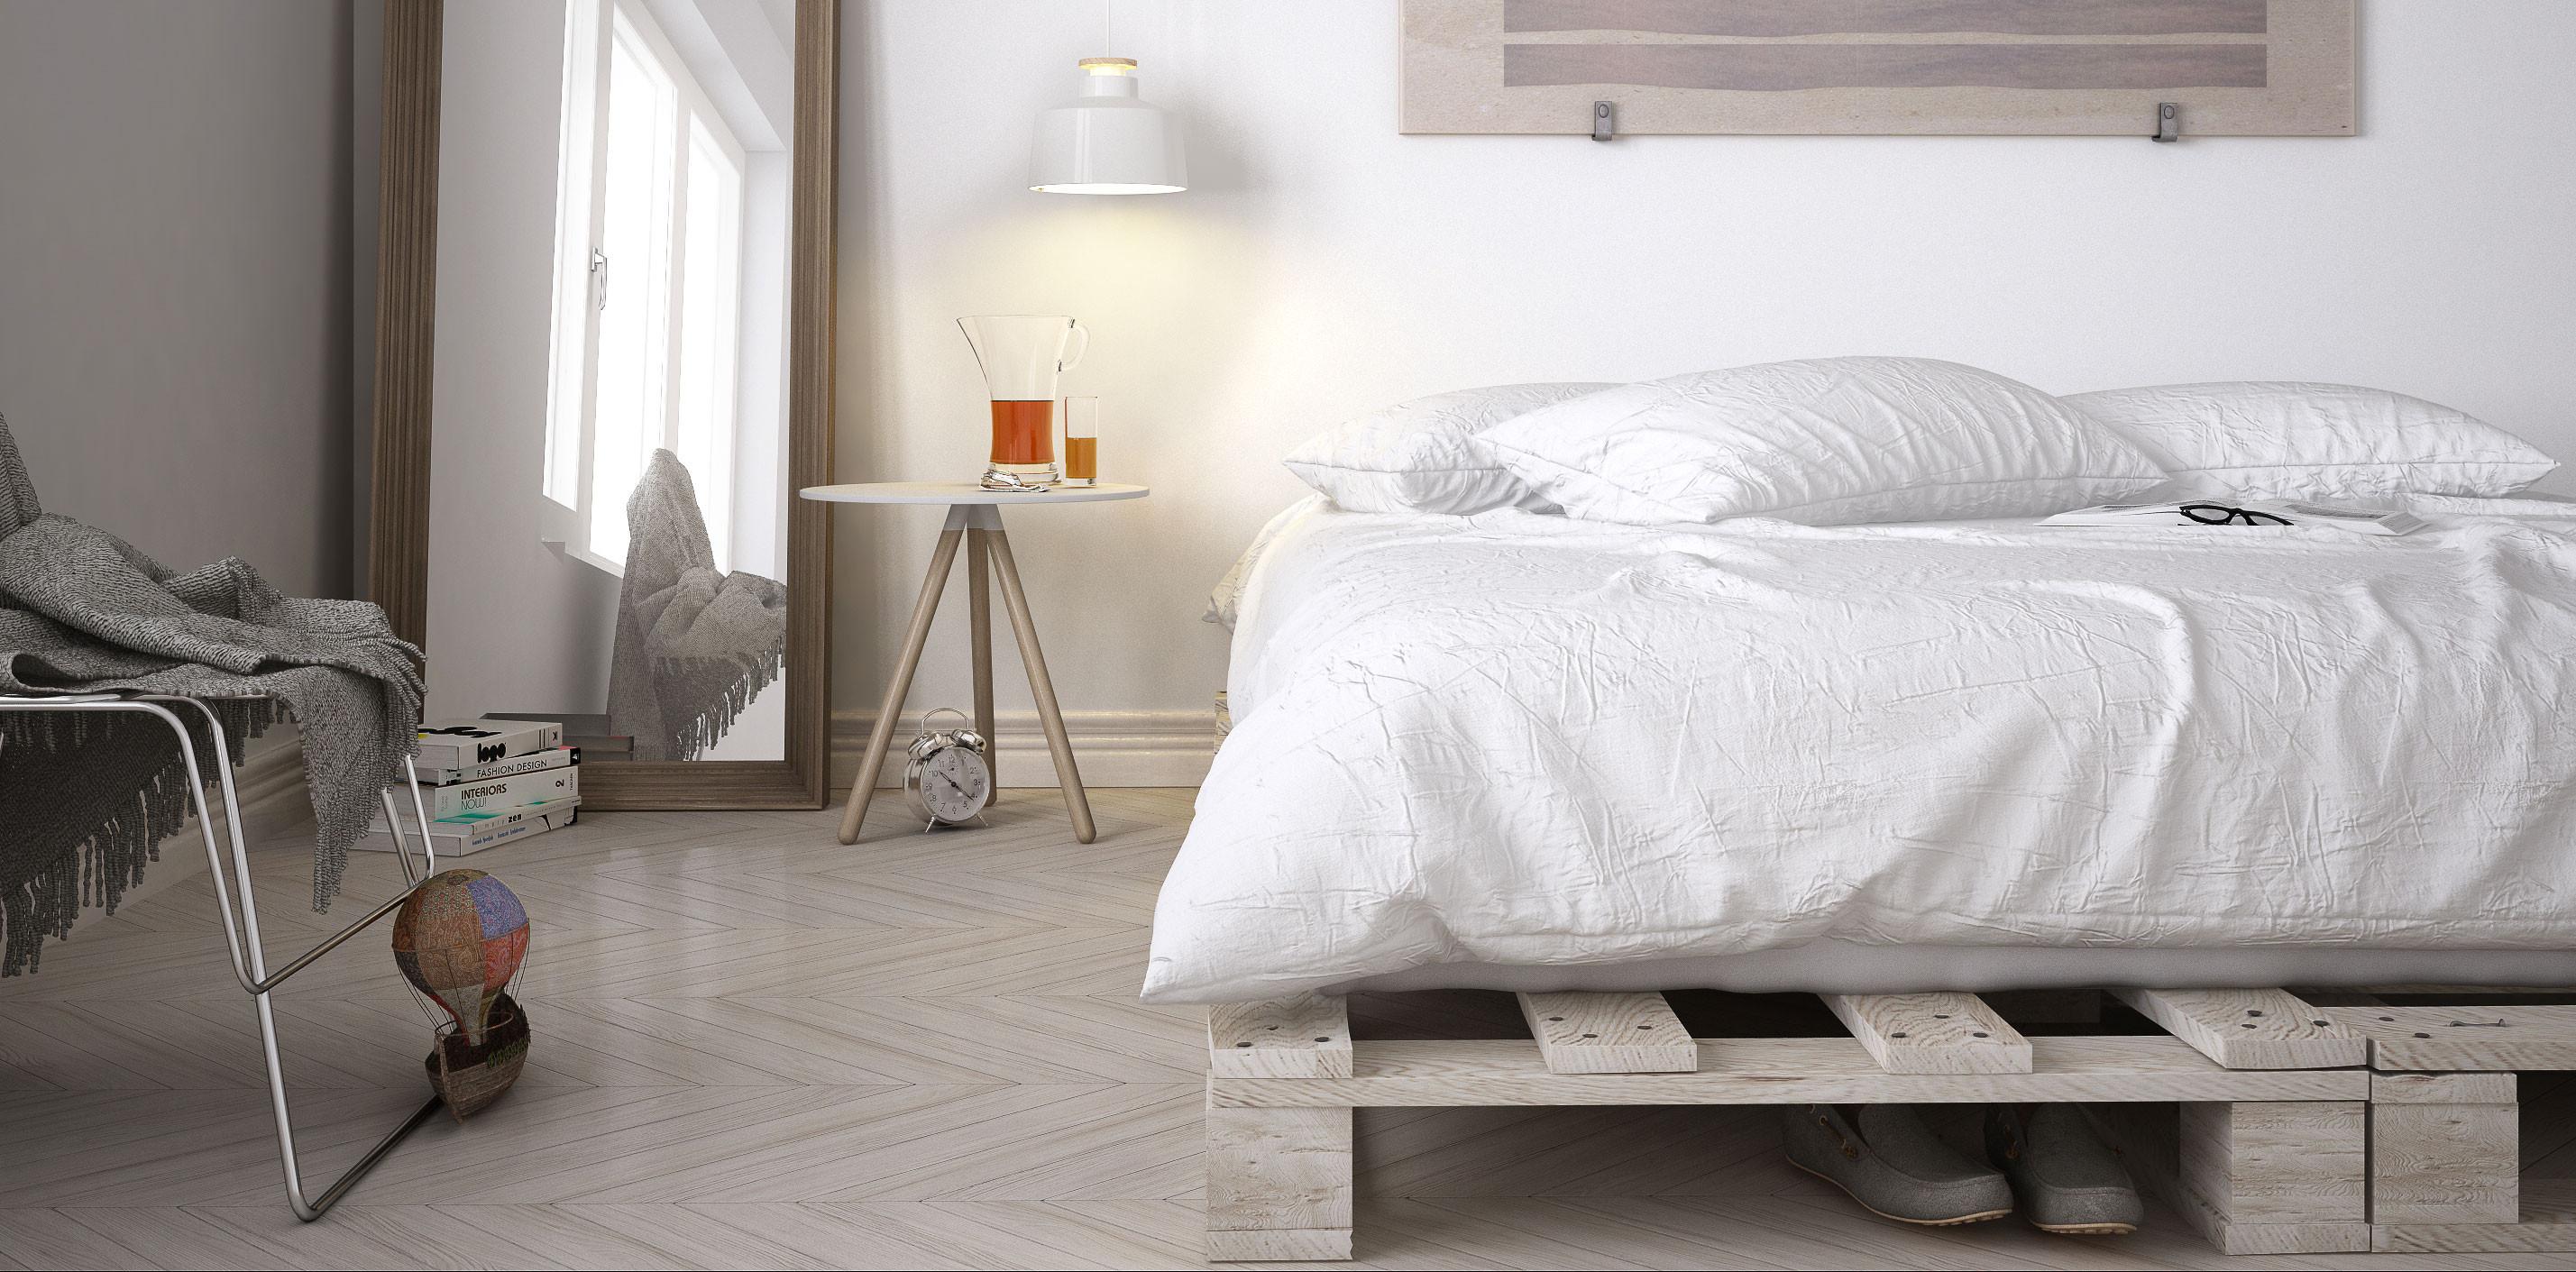 Palettenbett Diy  Palettenbett bauen DIY zum günstigen Single oder Doppelbett